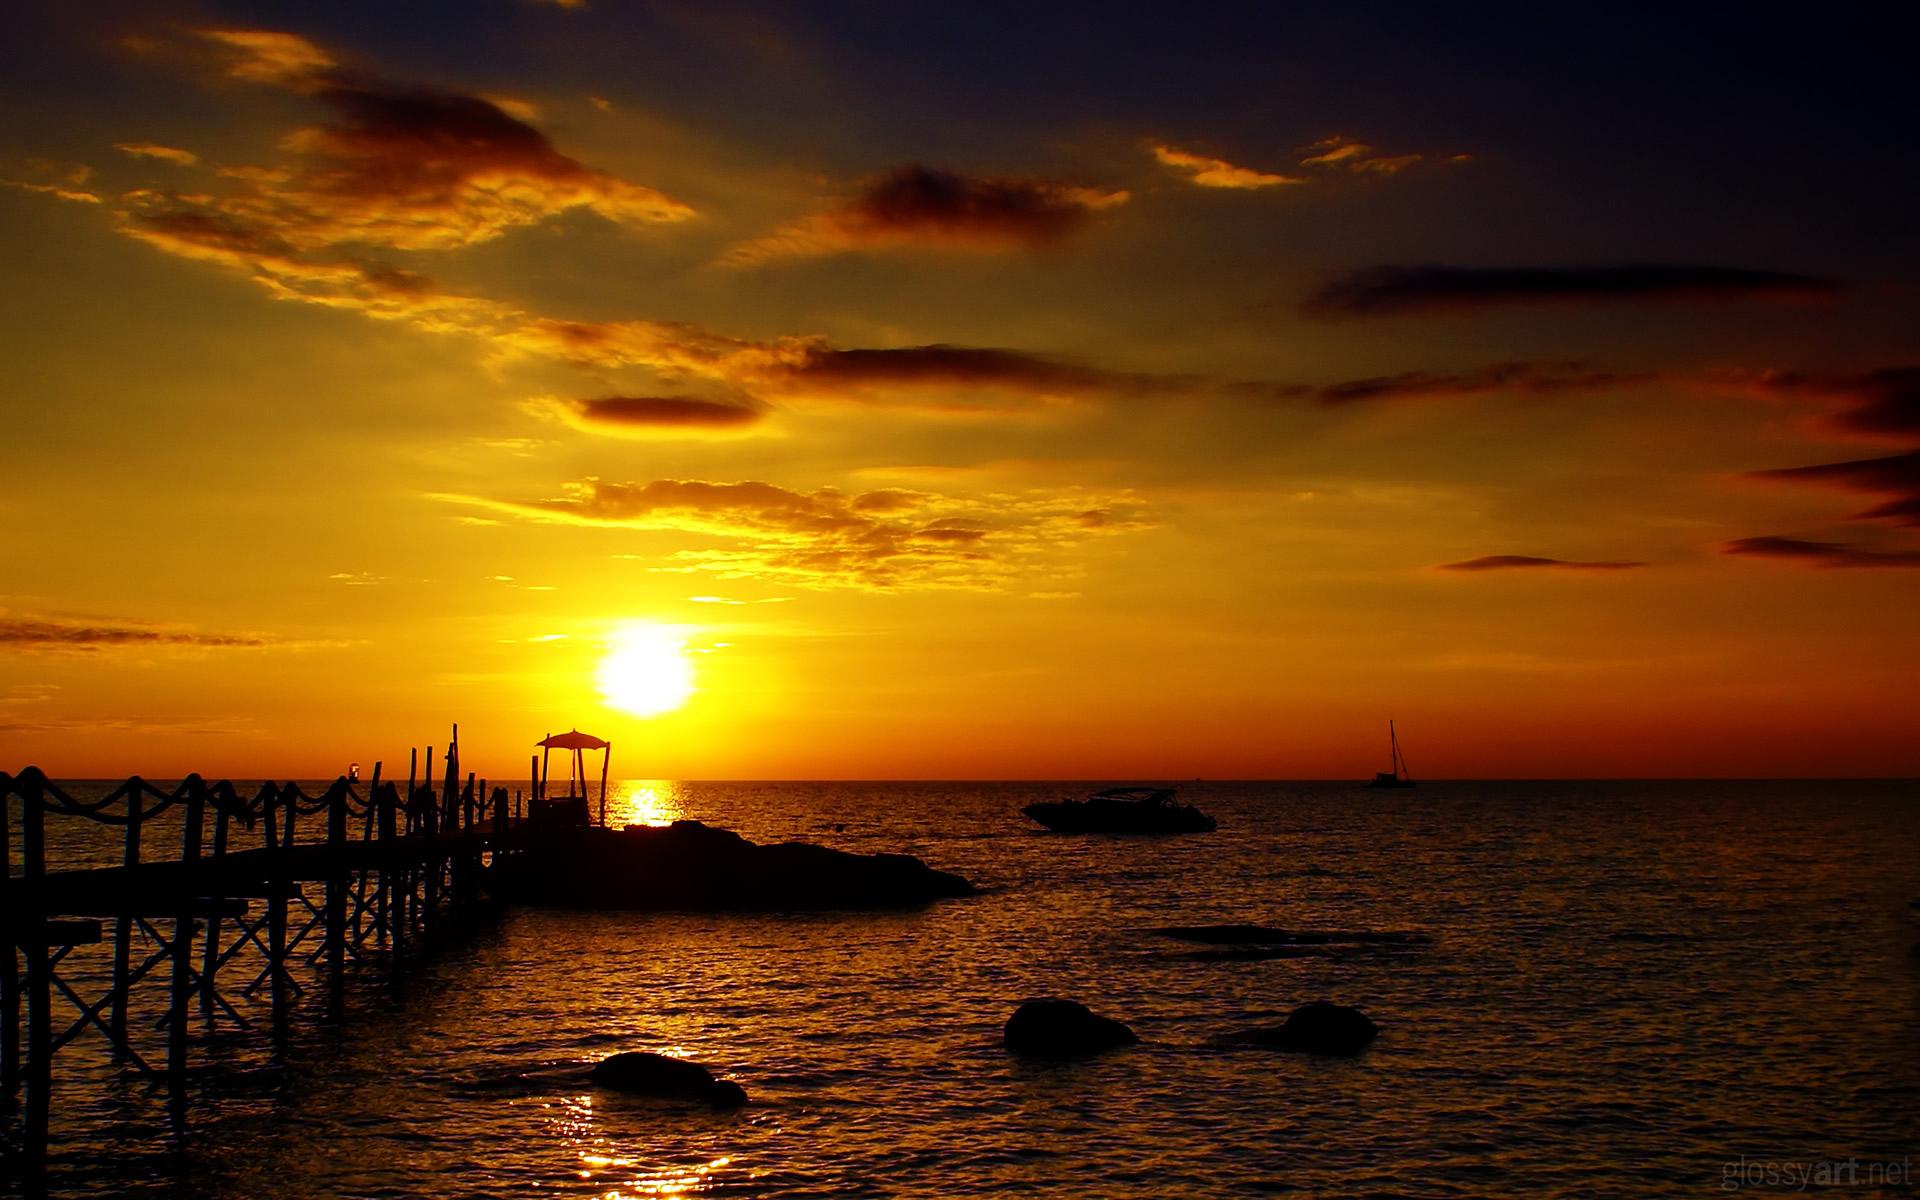 Theme Bin187 Blog Archive 187 Golden Sunset HD Wallpaper 1920x1200